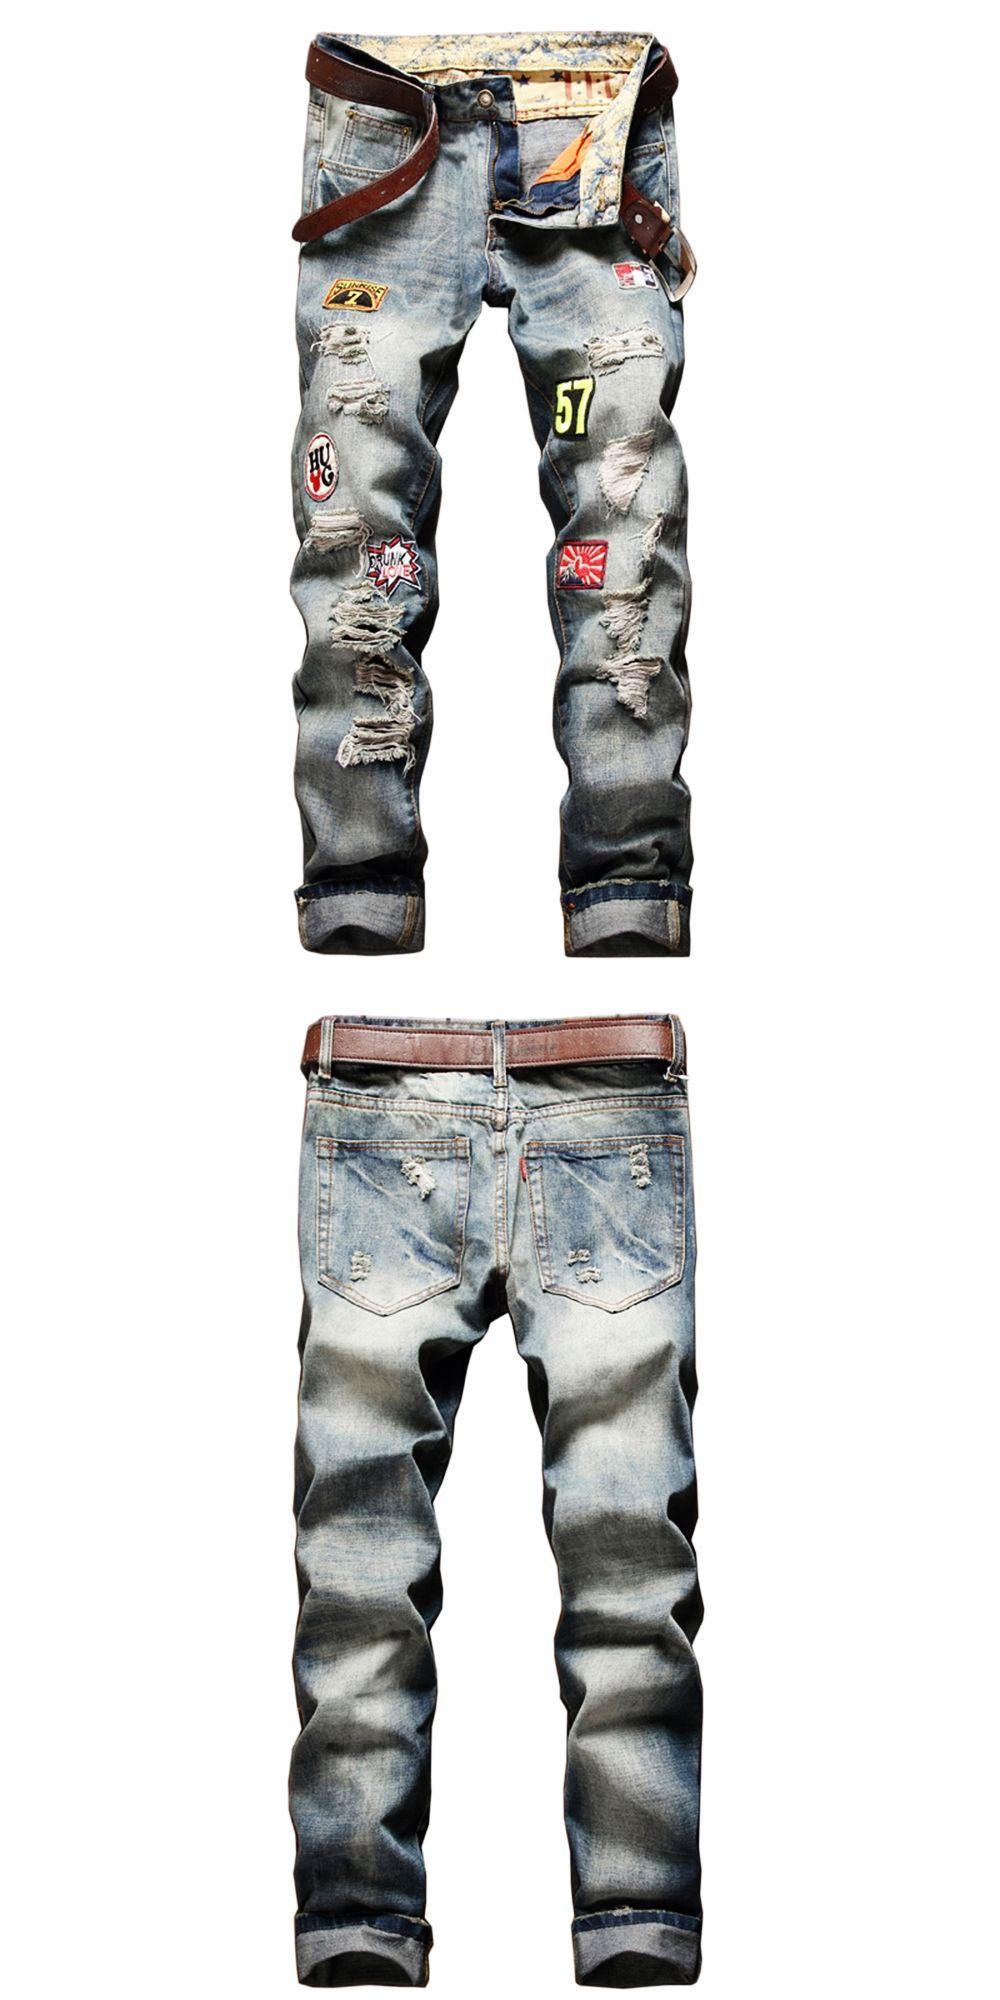 1f986b4b New 2017 Summer Autumn Fashion Mens Skinny Jean Pants Ripped Holes Vintage Washed  Denim Pants Hip